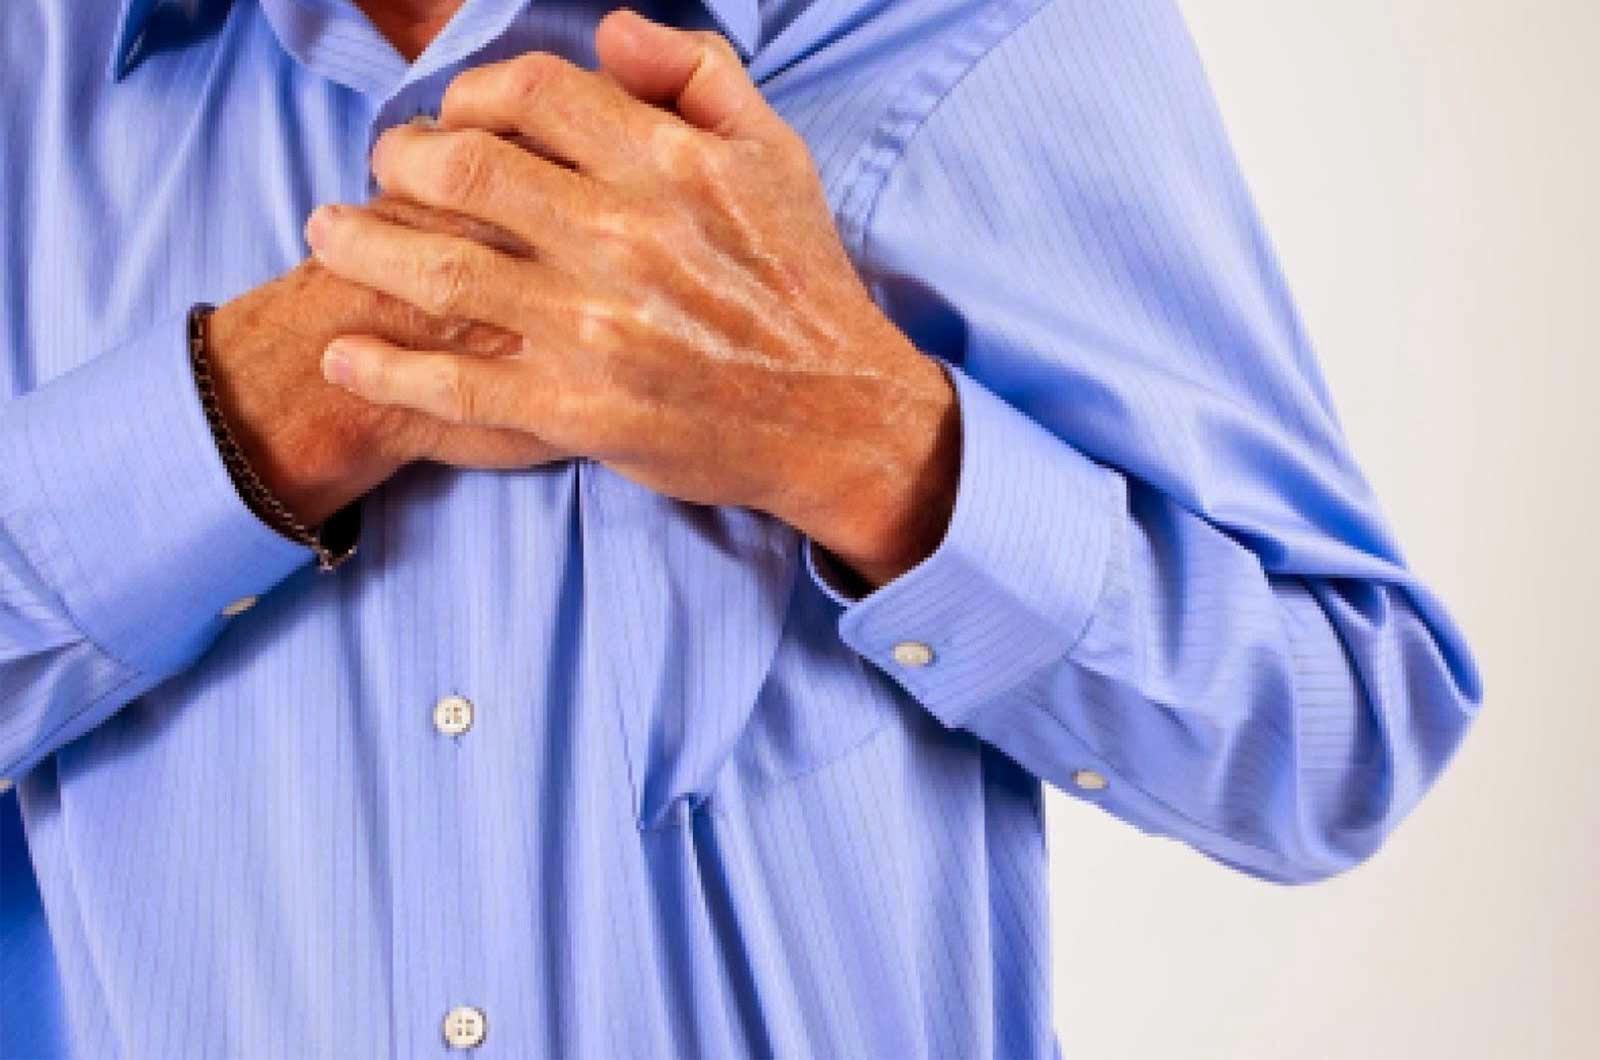 penyembuhan penyakit jantung dengan propolis